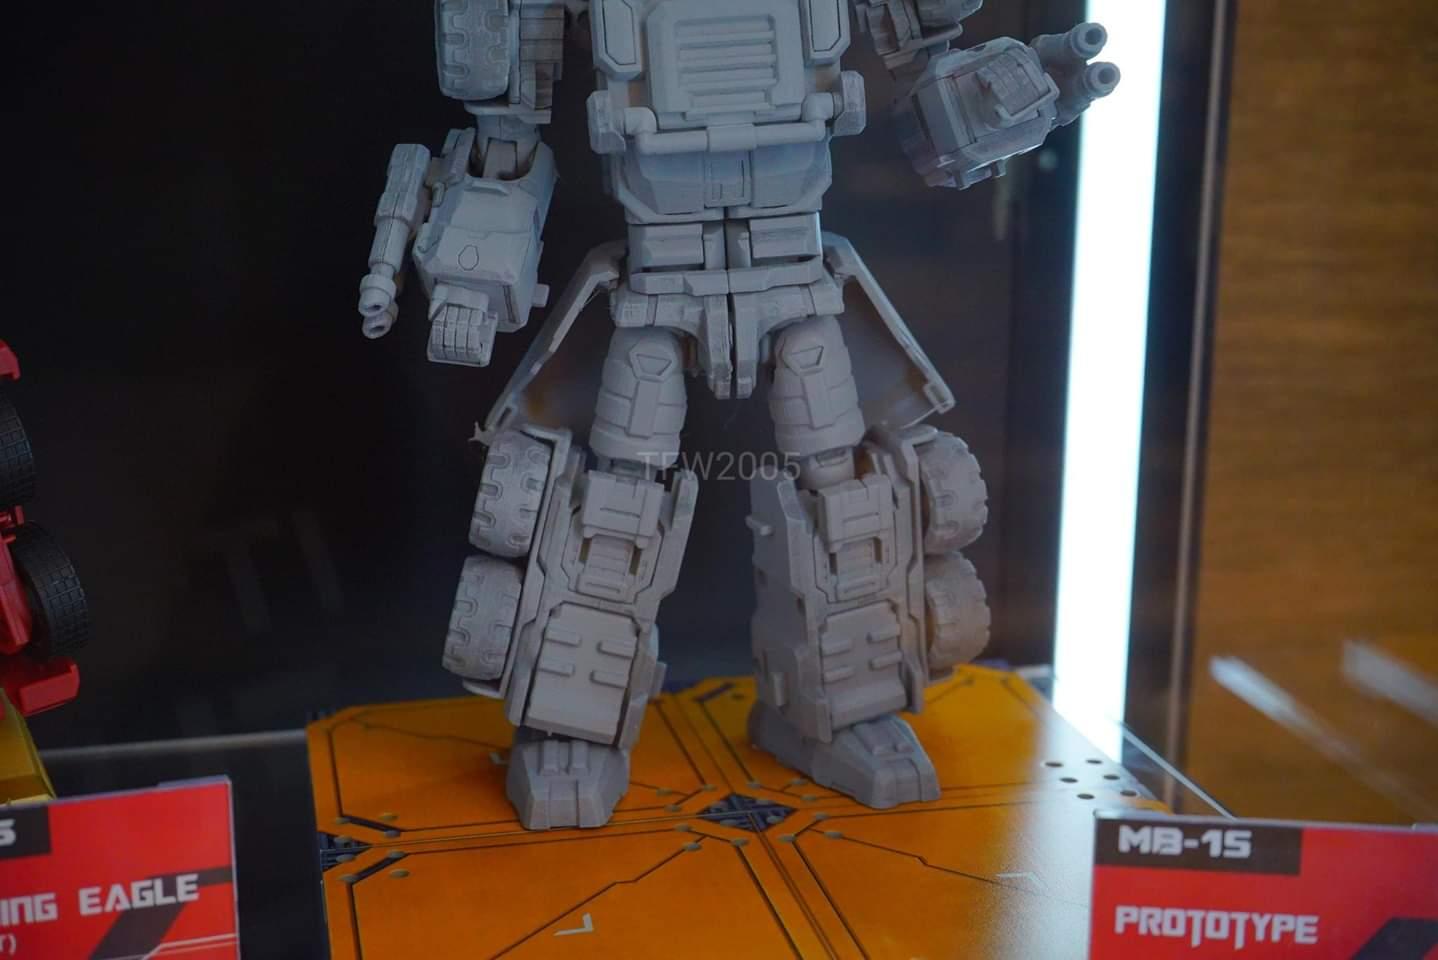 [FansHobby] Produit Tiers - Master Builder MB-15, MB-xx et MB-xx - aka Armada Optimus Prime, Jetfire et Overload XxRFgjxH_o